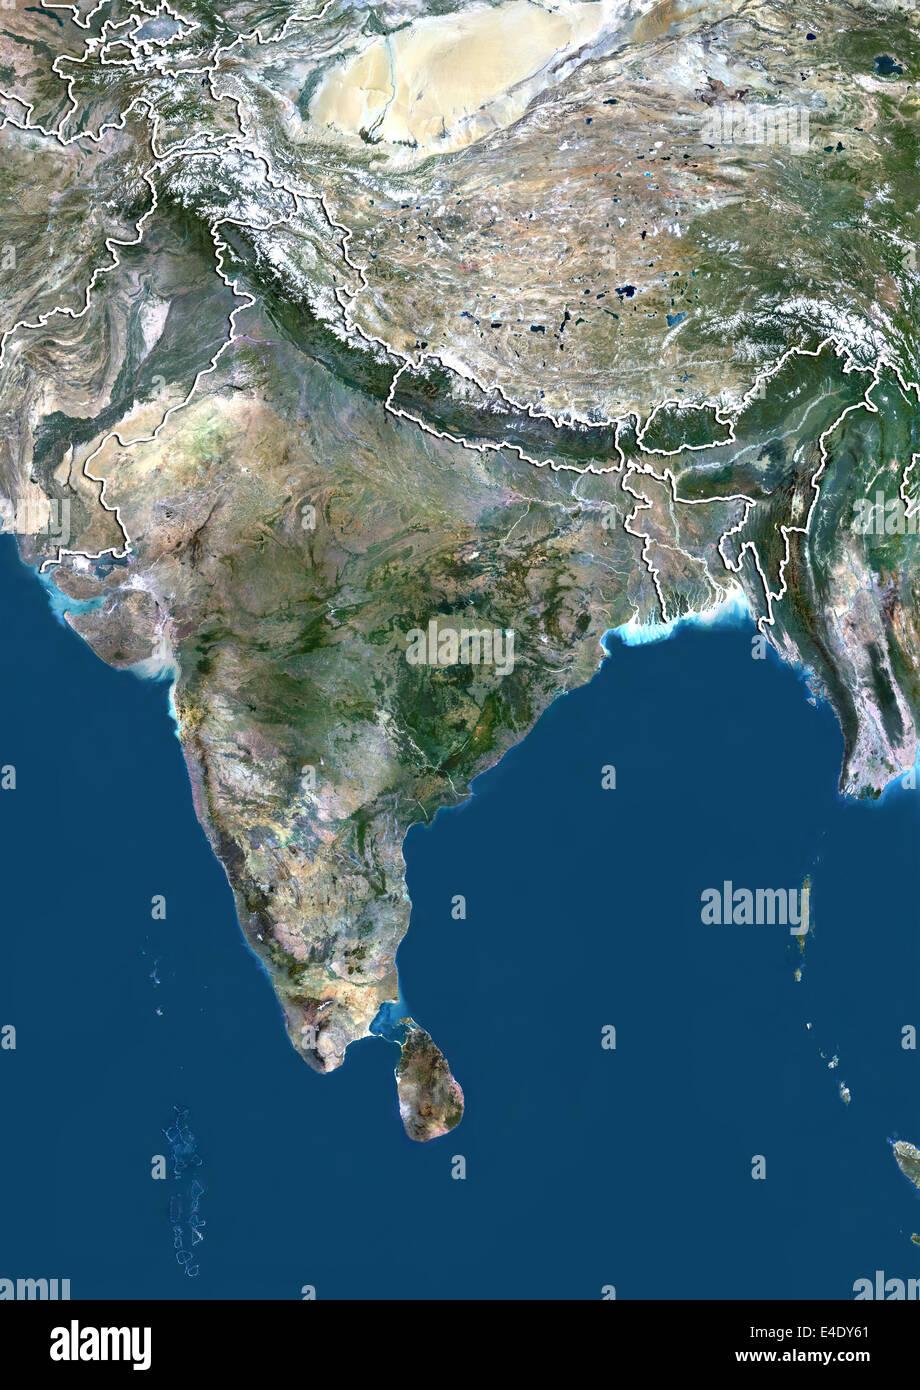 India, True Colour Satellite Image With Border - Stock Image